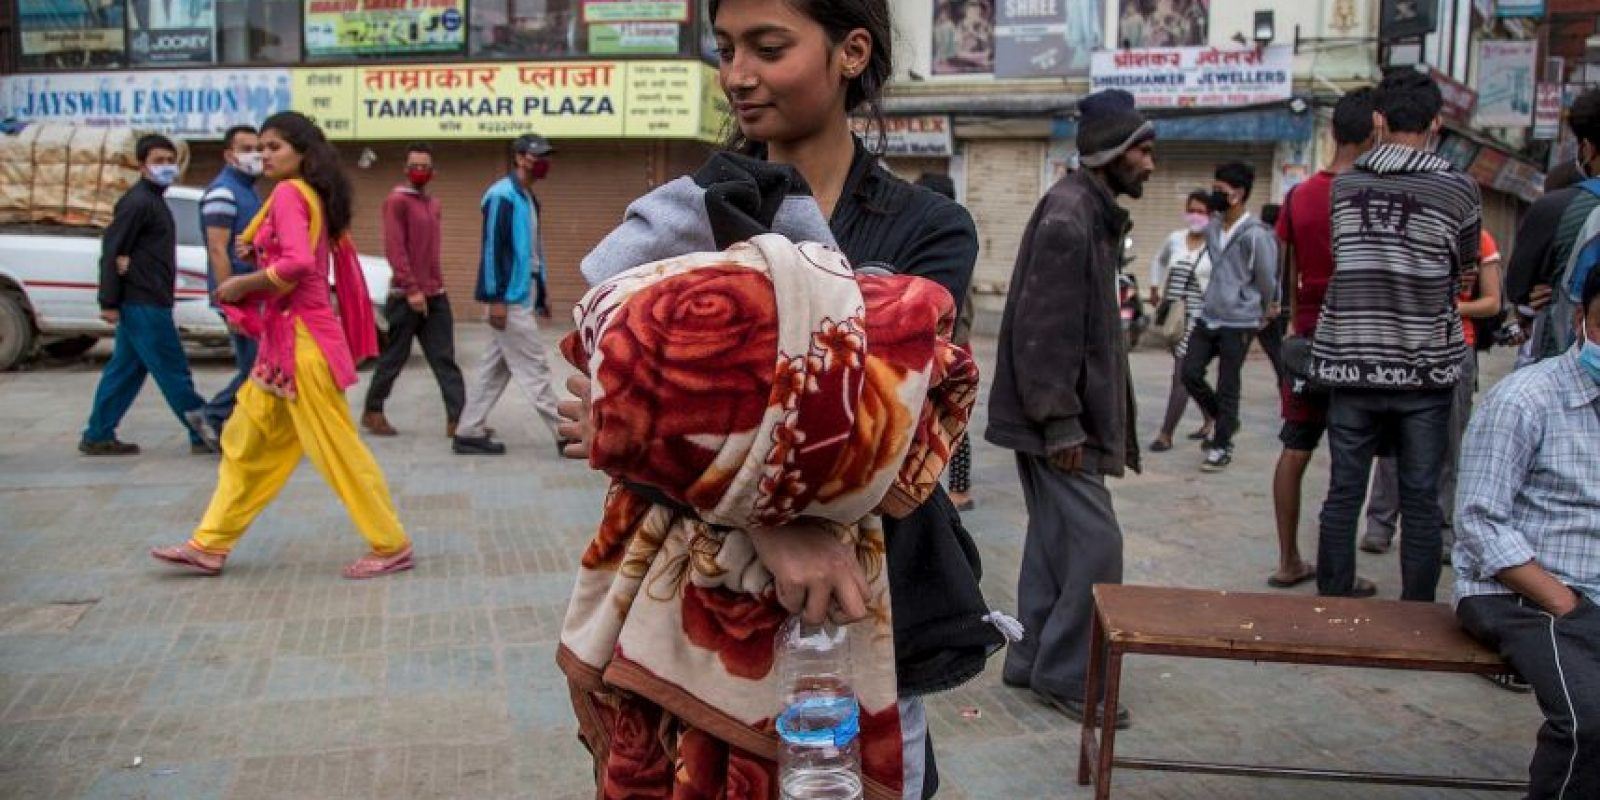 10. Los hospitales de la capital Katmandú están repletos. Foto:Getty Images